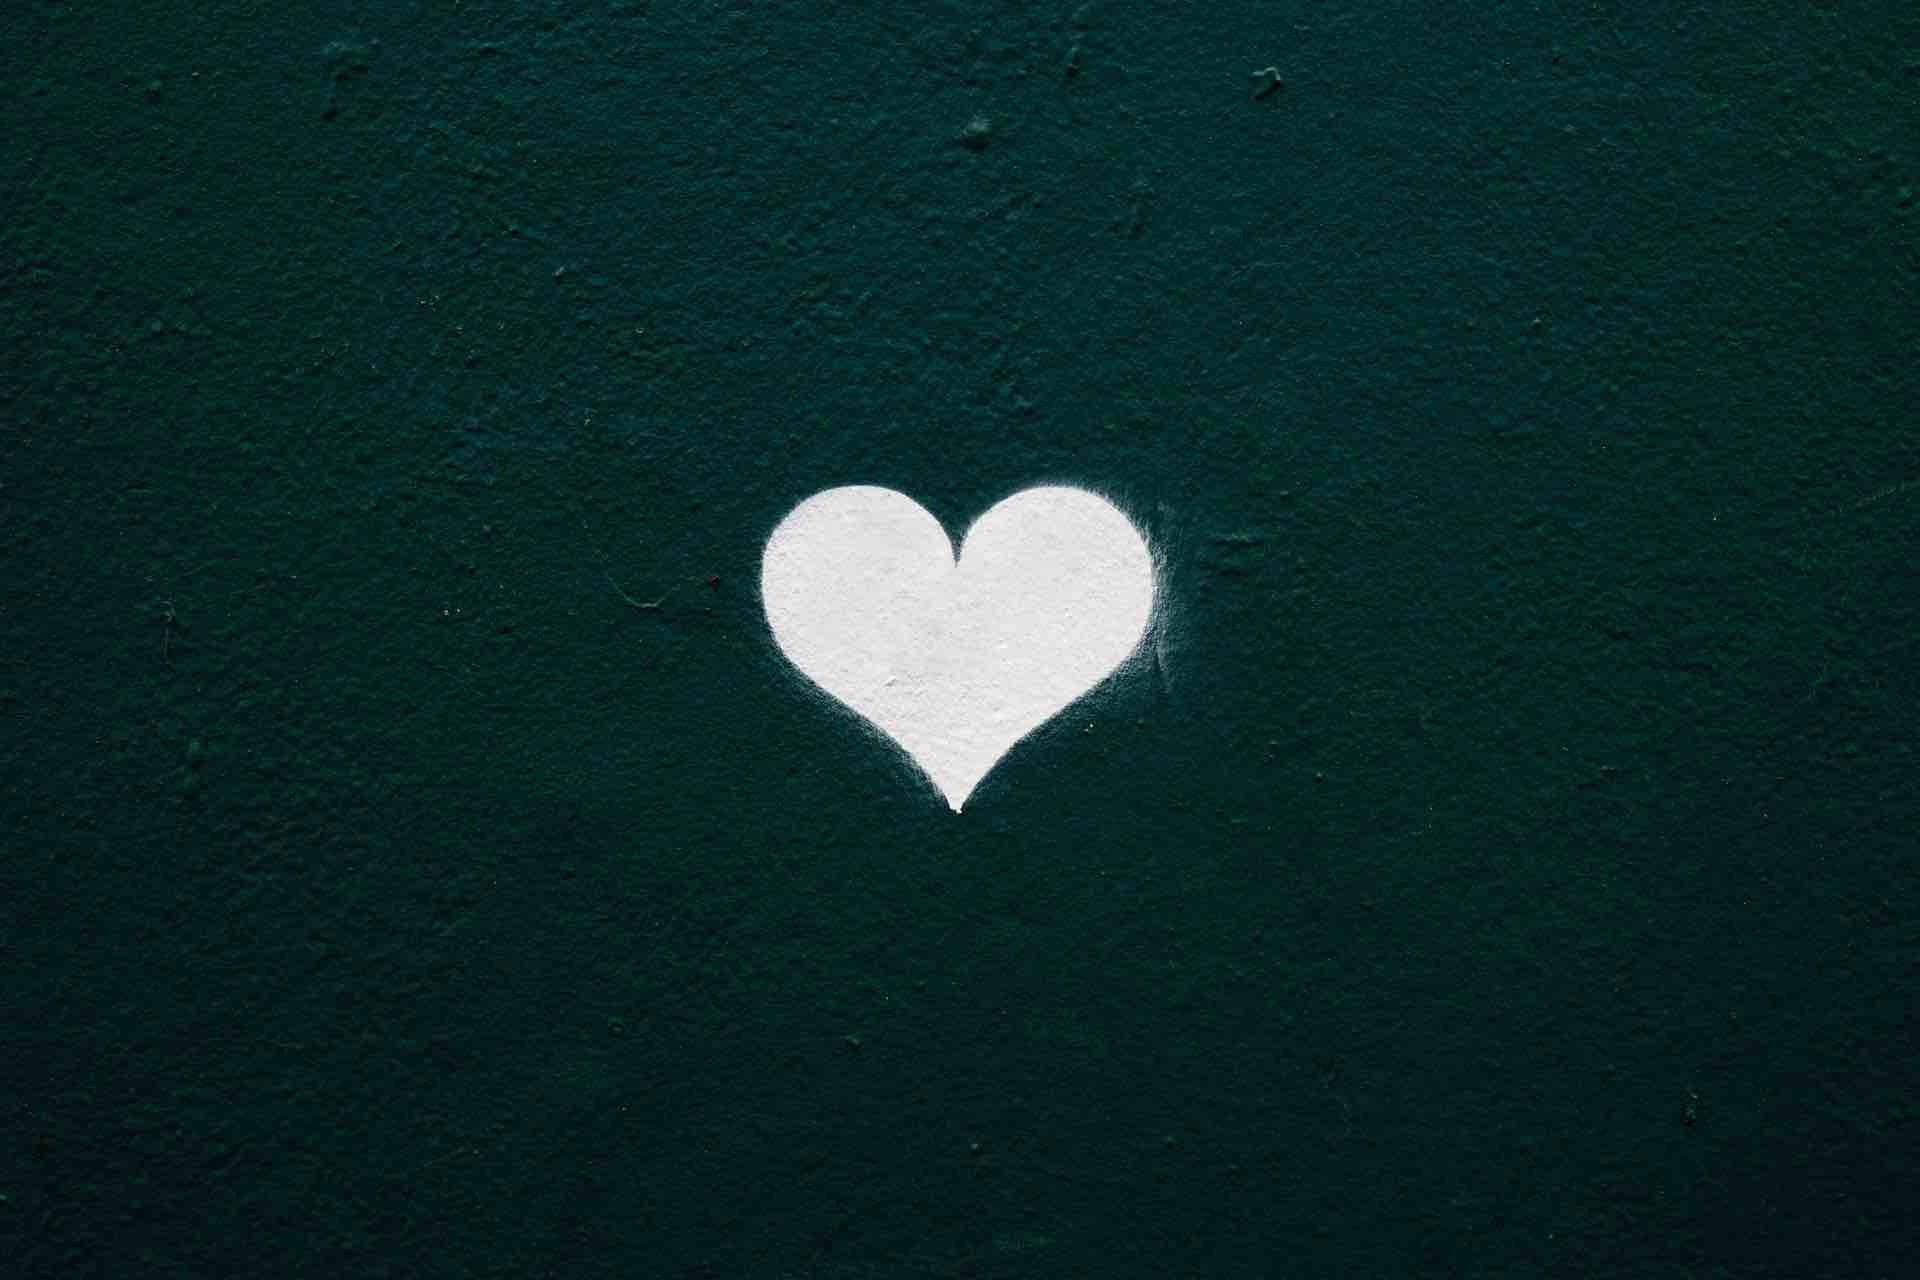 coeur blanc fond noir forme